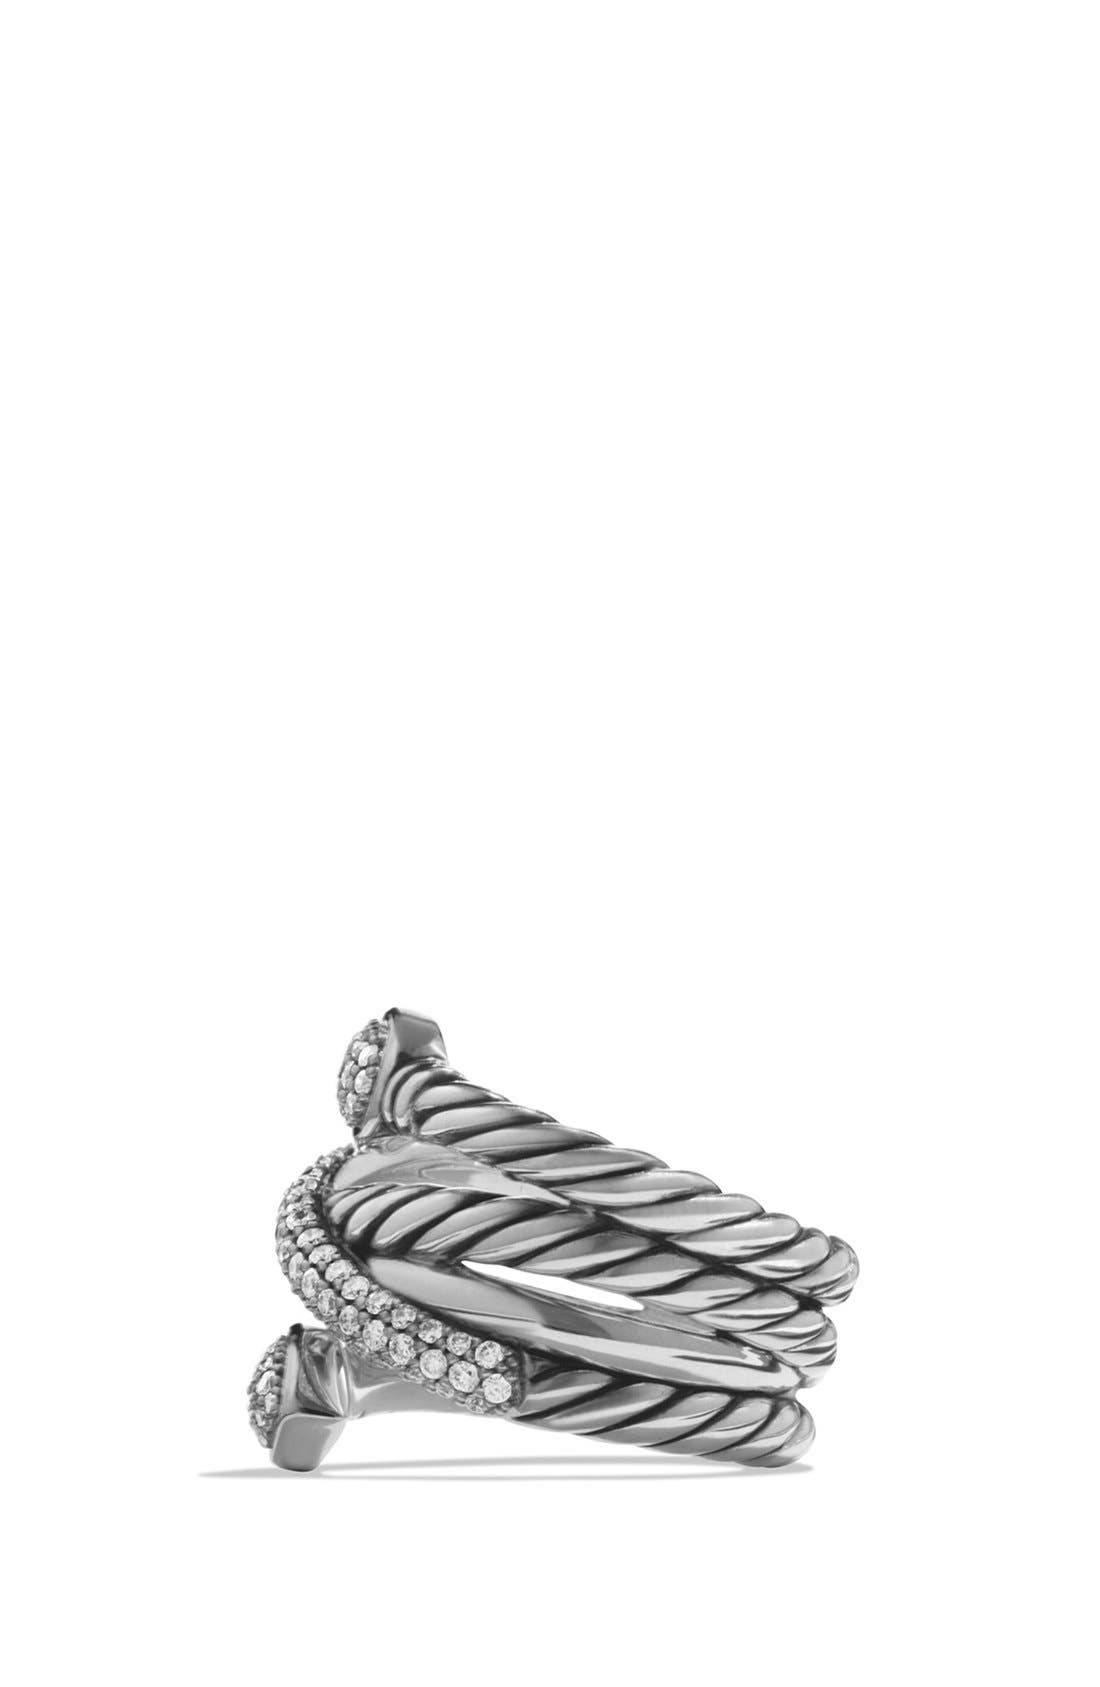 'Renaissance' Ring with Diamonds,                             Alternate thumbnail 3, color,                             040